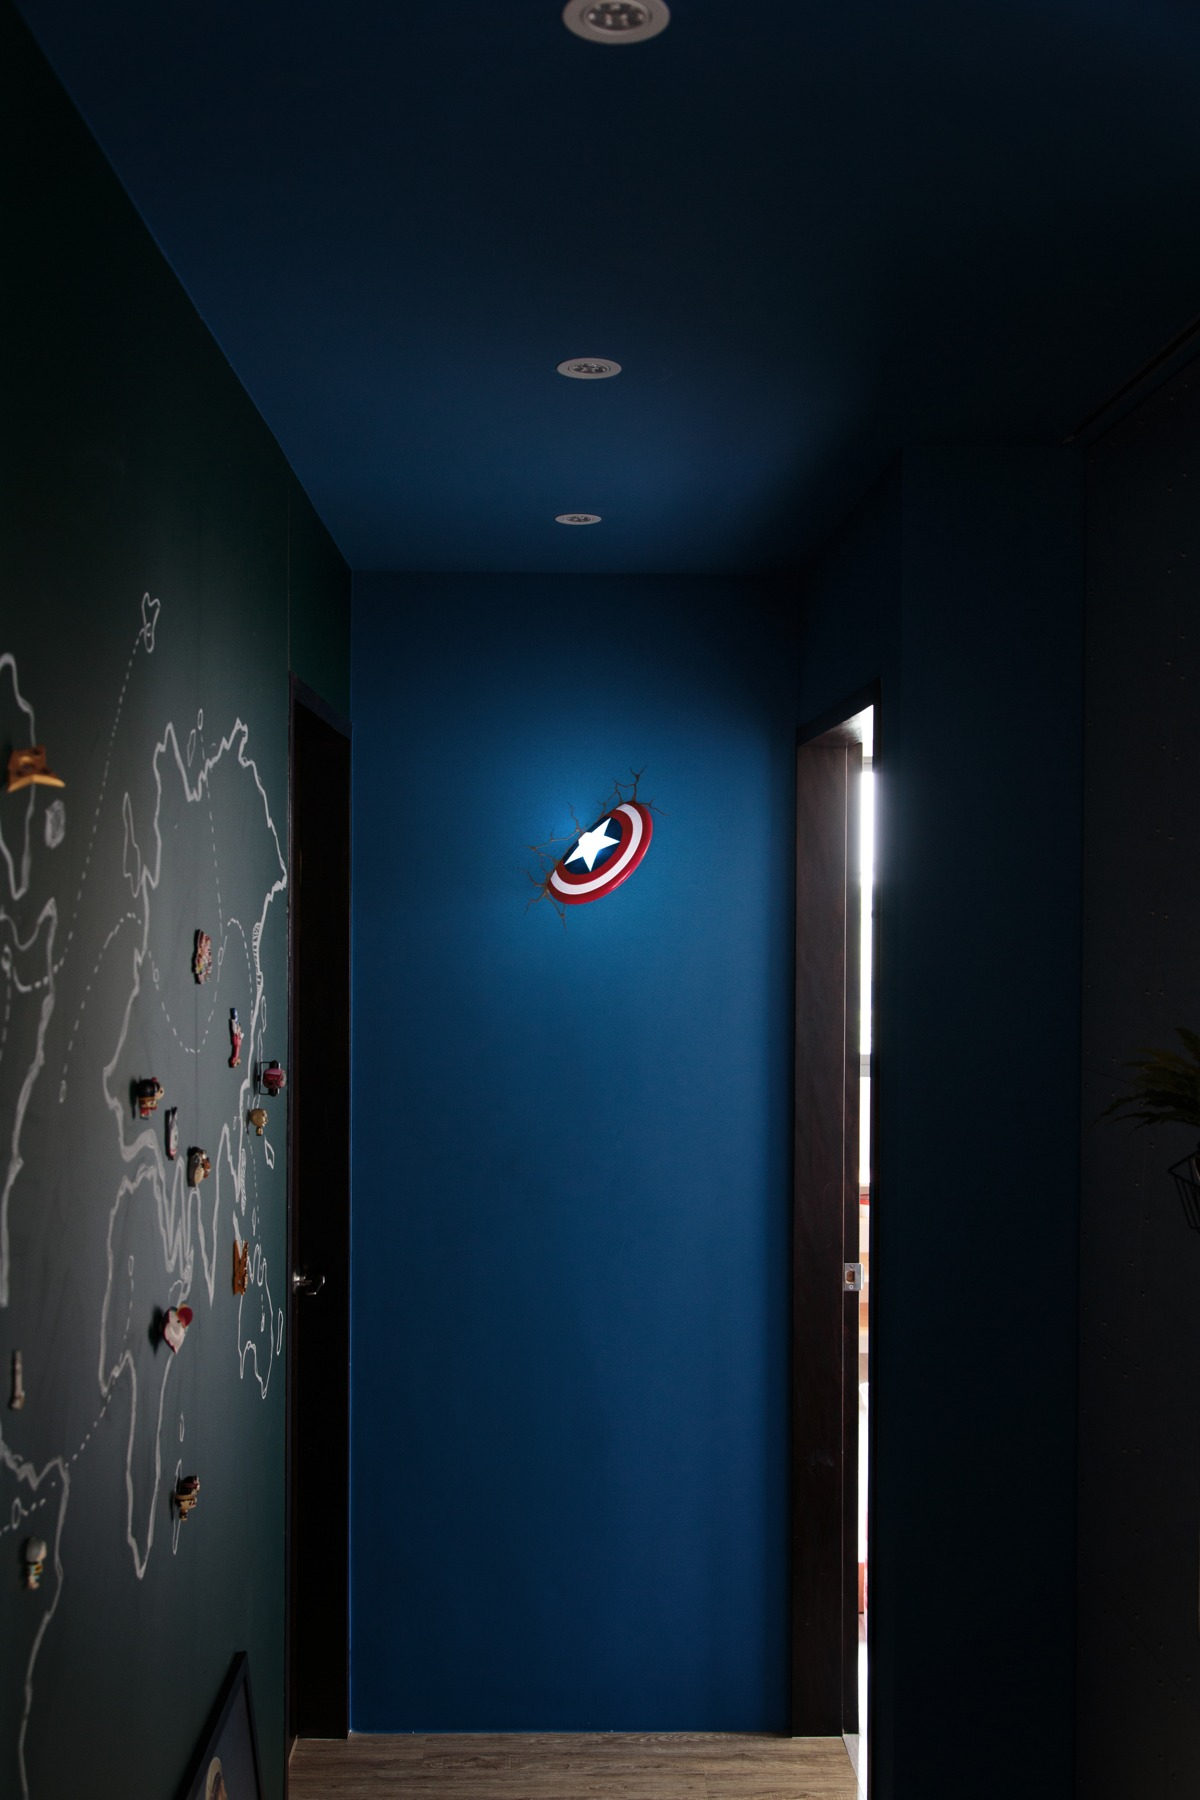 Superhero Bedroom Decor Unique Apartment Designs Ideas With Superhero Decor Roohome